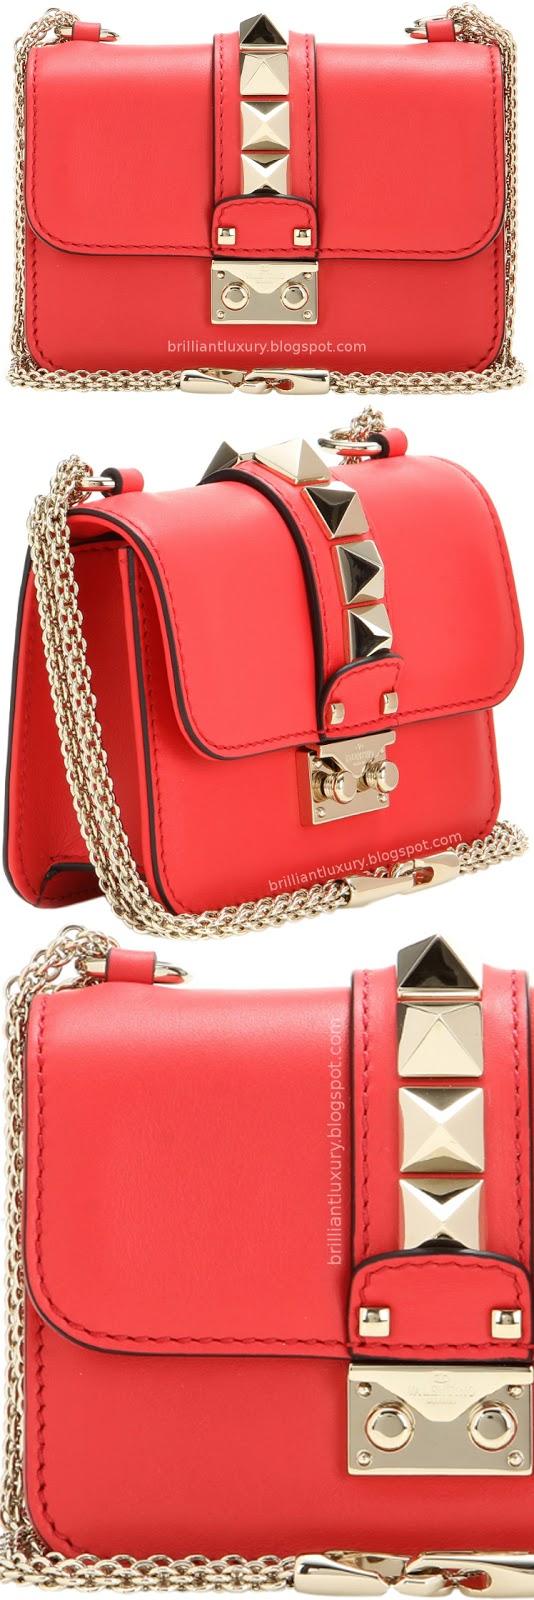 Brilliant Luxury ♦ Valentino Garavani Lock mini red leather shoulder bag